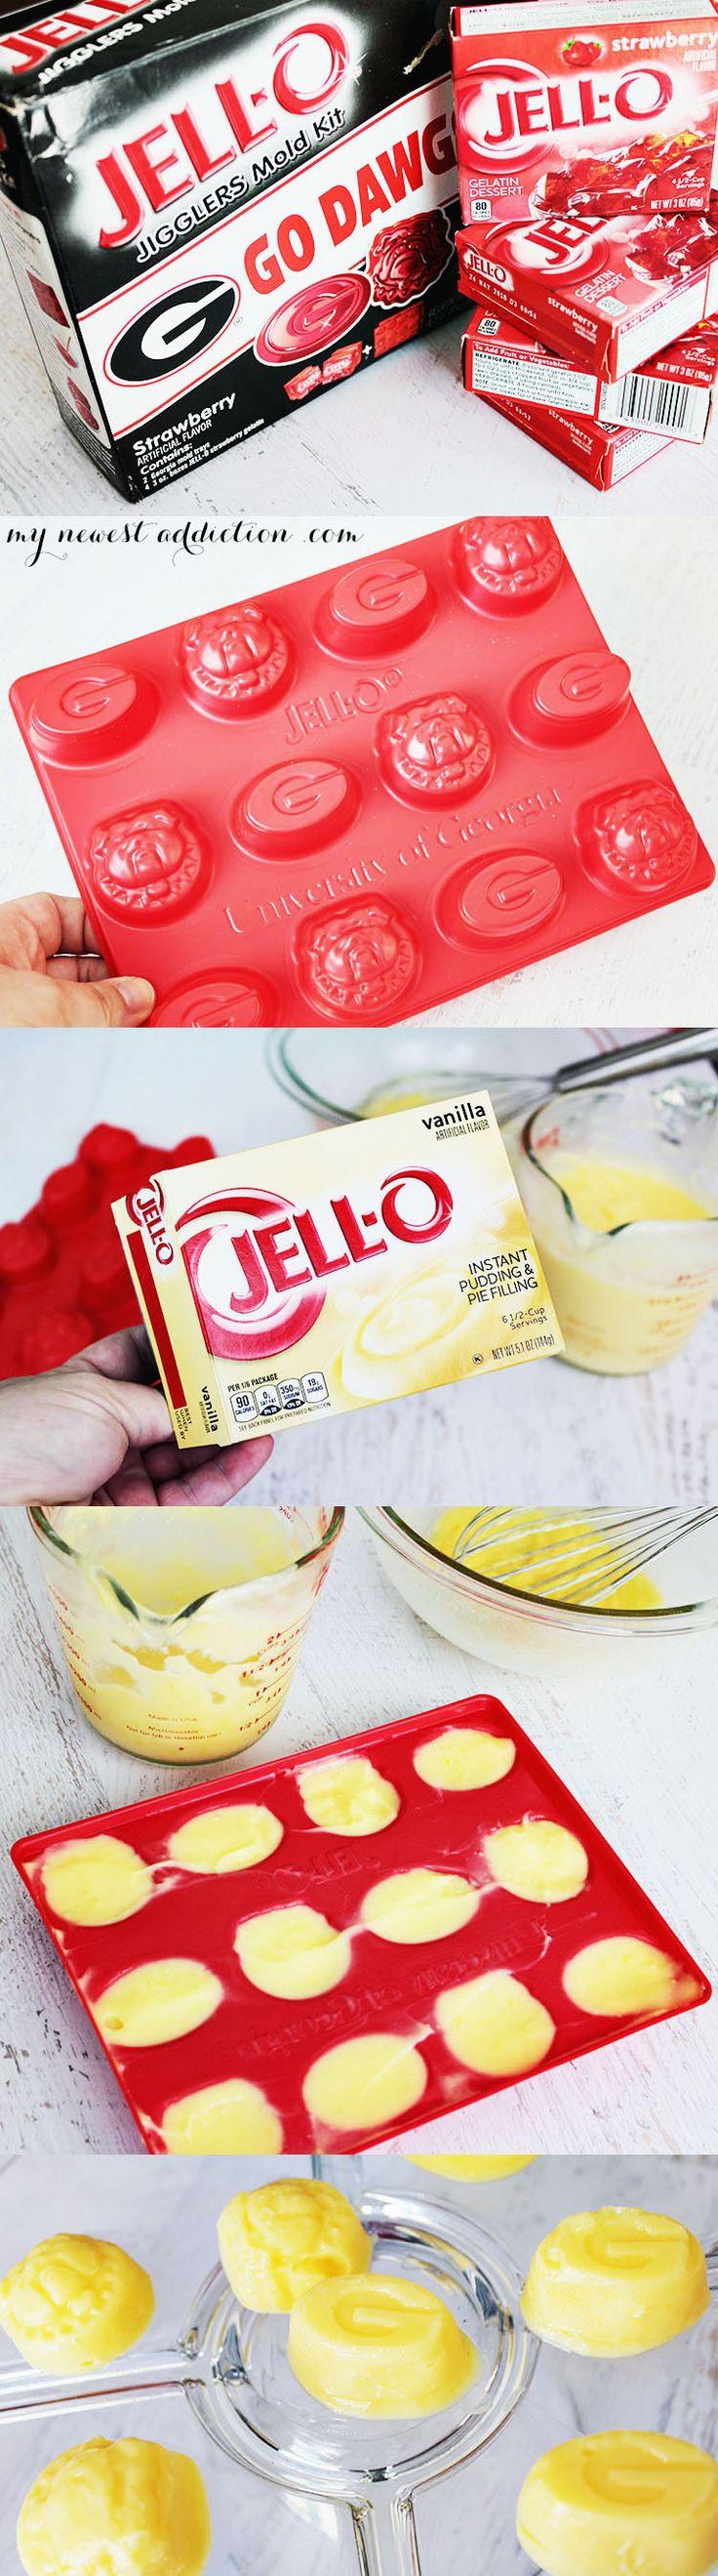 University of Georgia Jello Mold + Dawg Food Recipe #TeamJellO #shop